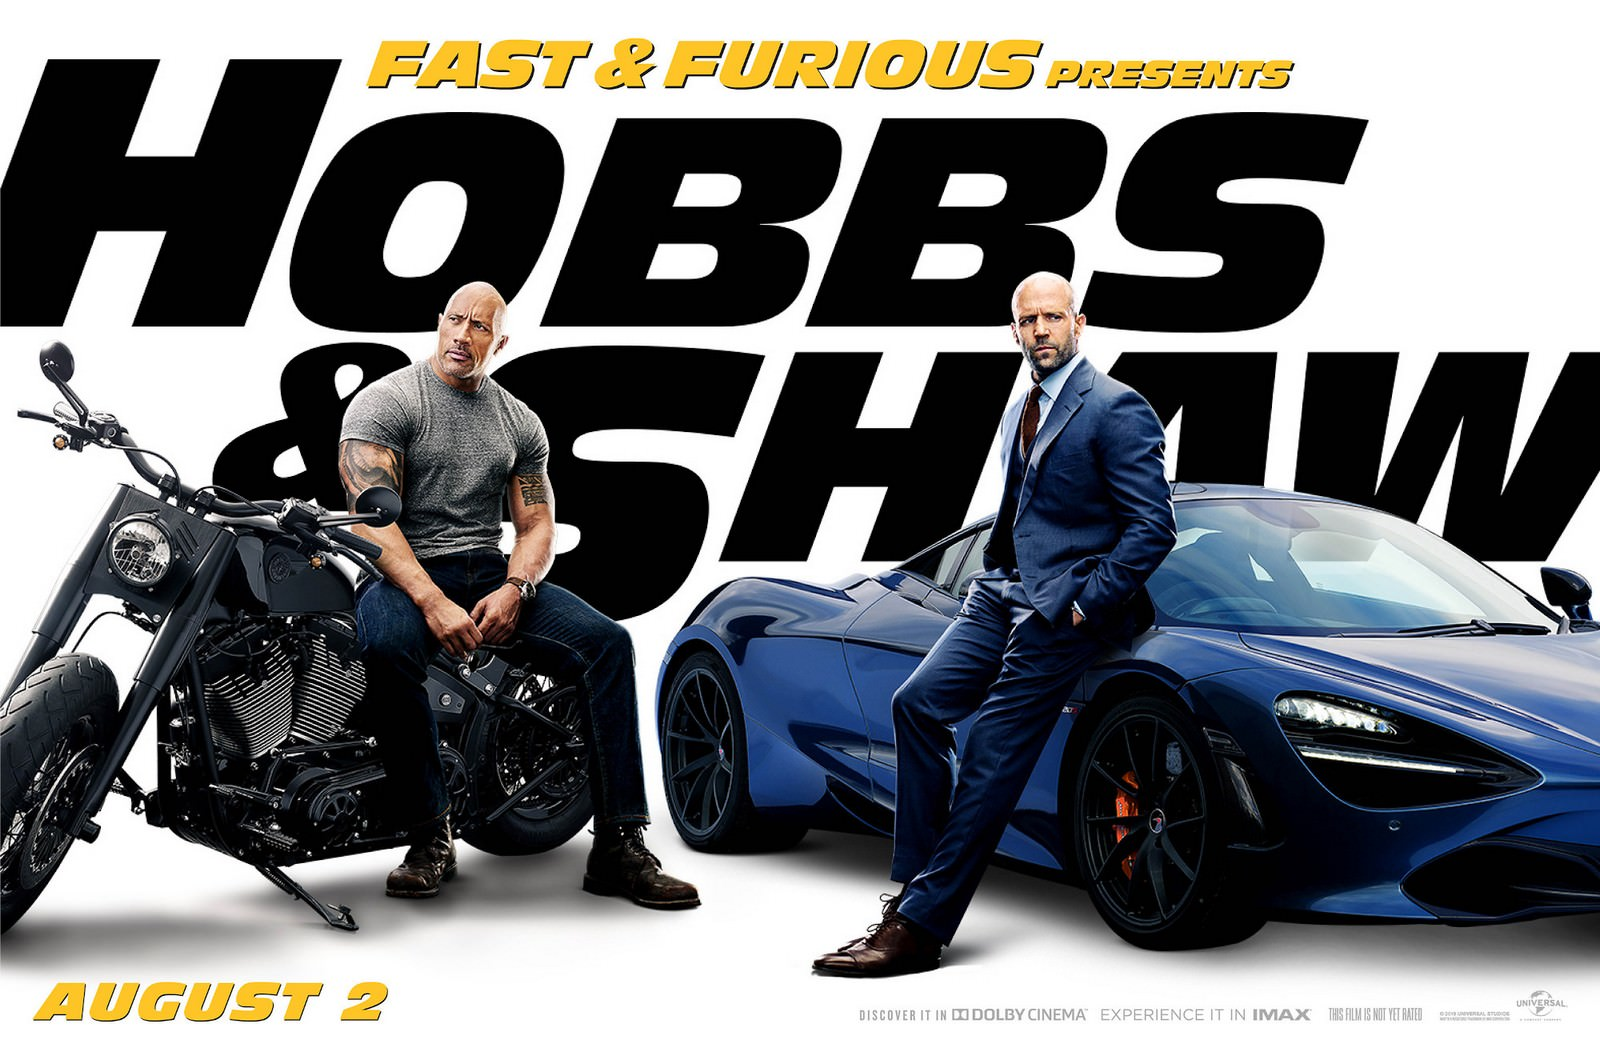 Movie, Fast & Furious Presents: Hobbs & Shaw(美國, 2019年) / 玩命關頭:特別行動(台灣) / 速度与激情:特别行动(中國) / 狂野時速:雙雄聯盟(香港), 電影海報, 美國, 橫版